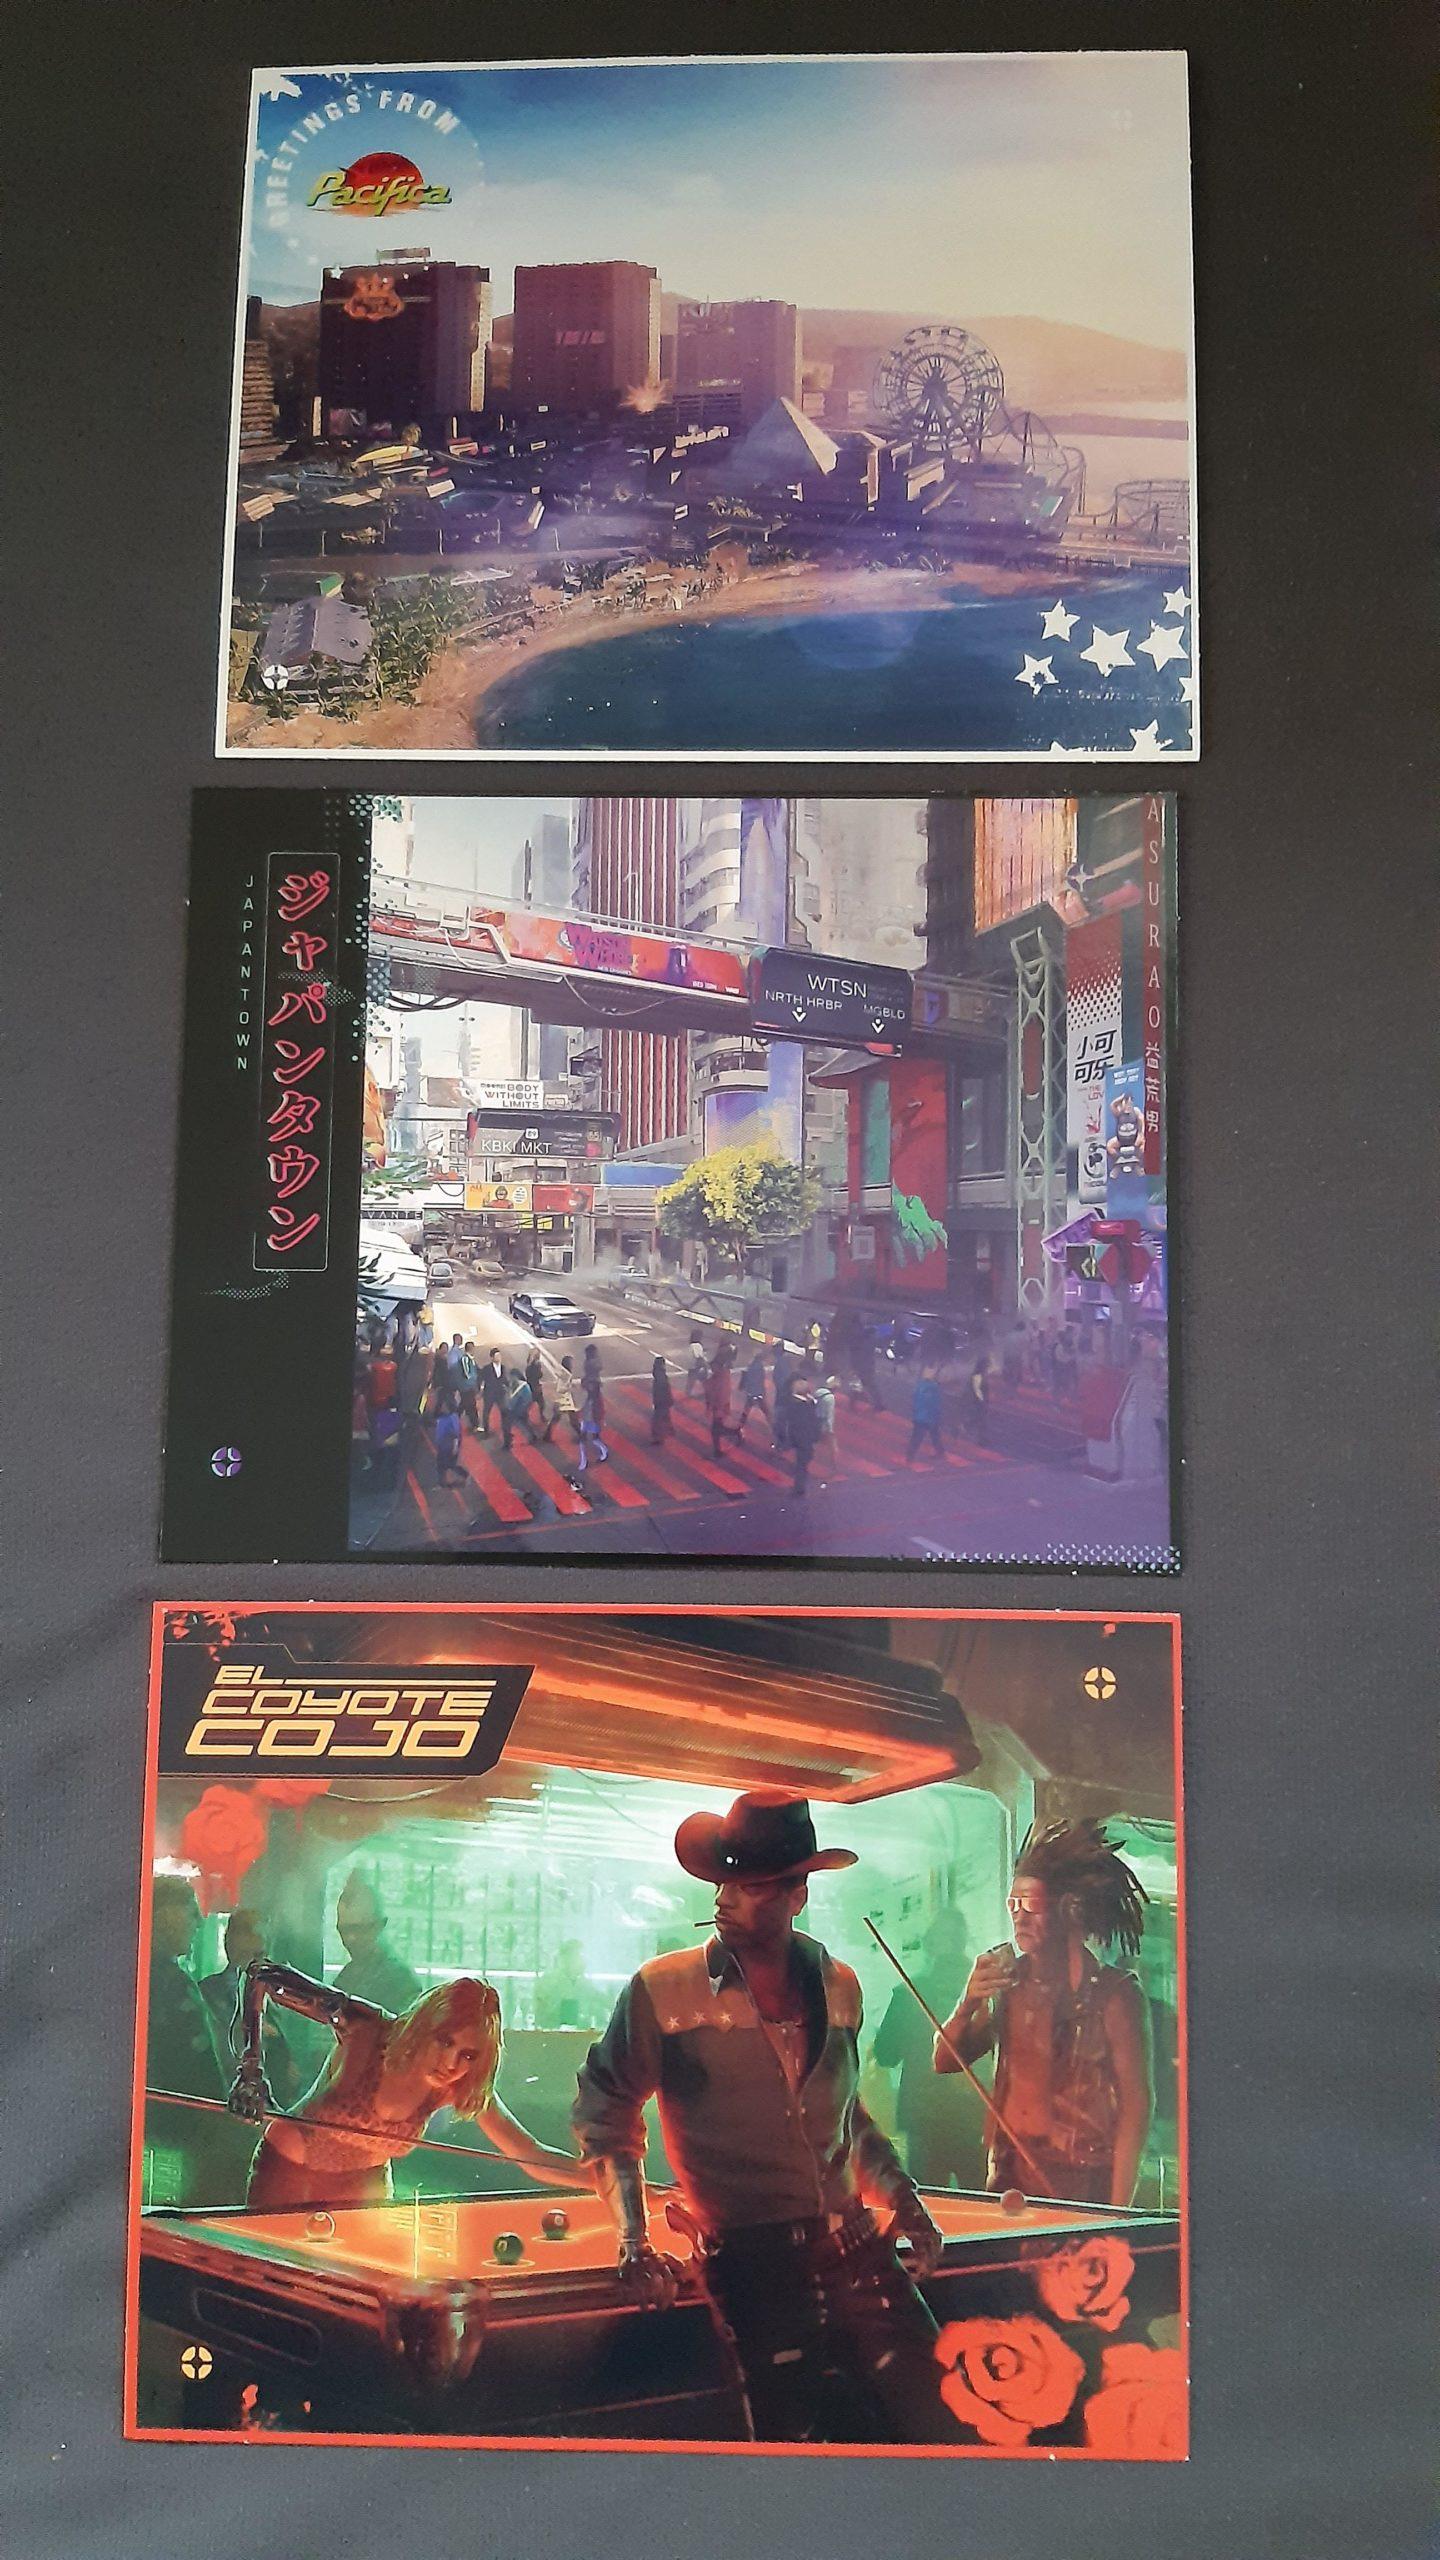 Cyberpunk 2077 Physical Edition Map